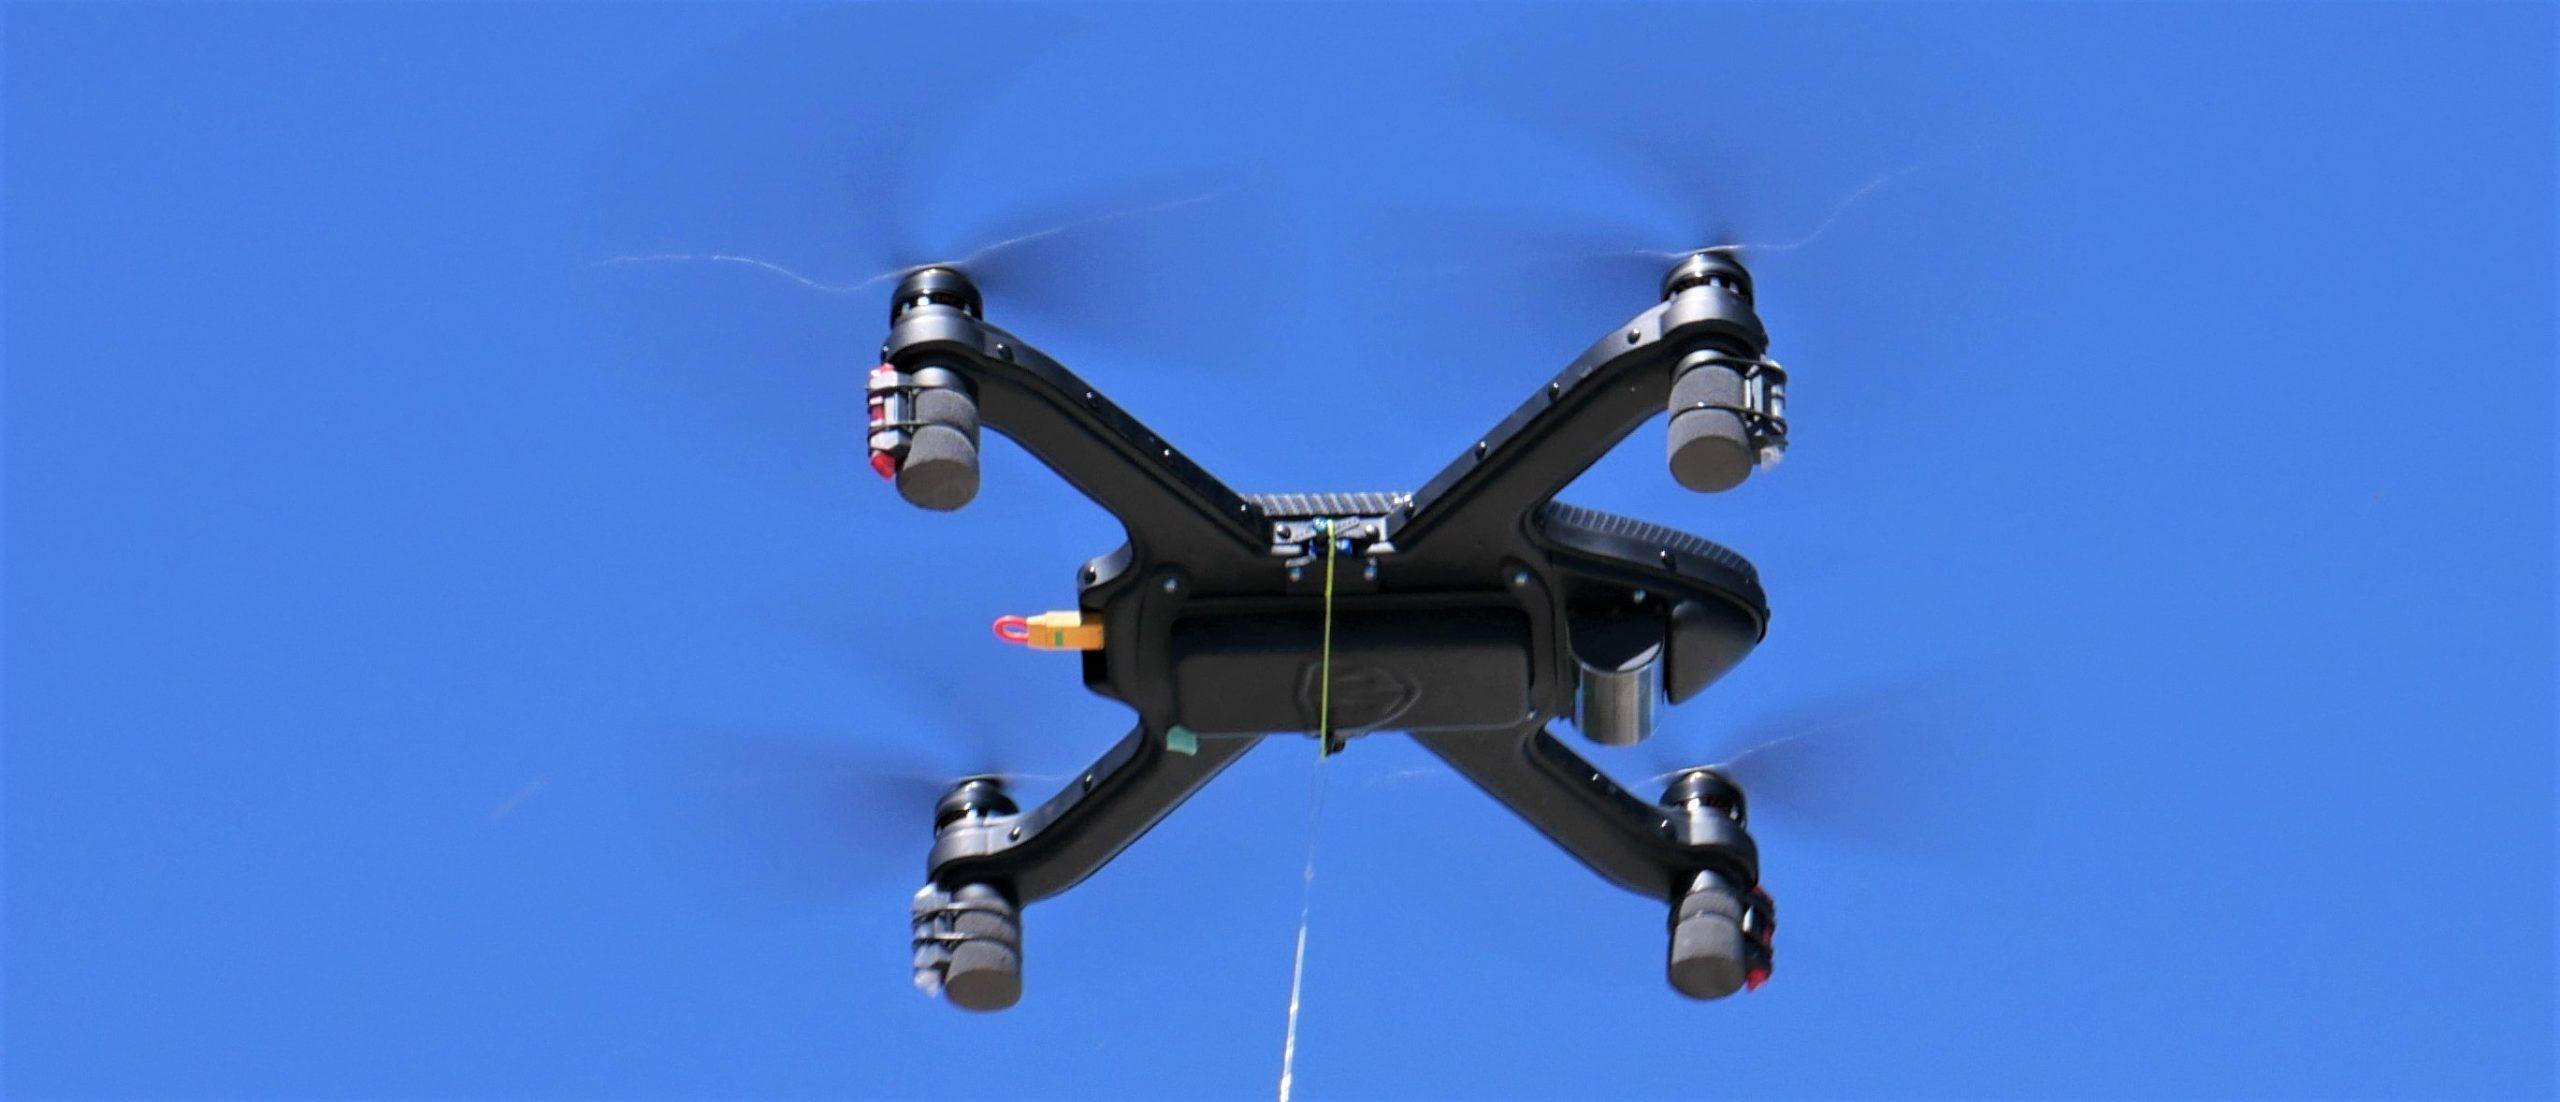 Cuta-Copter Drone in hover